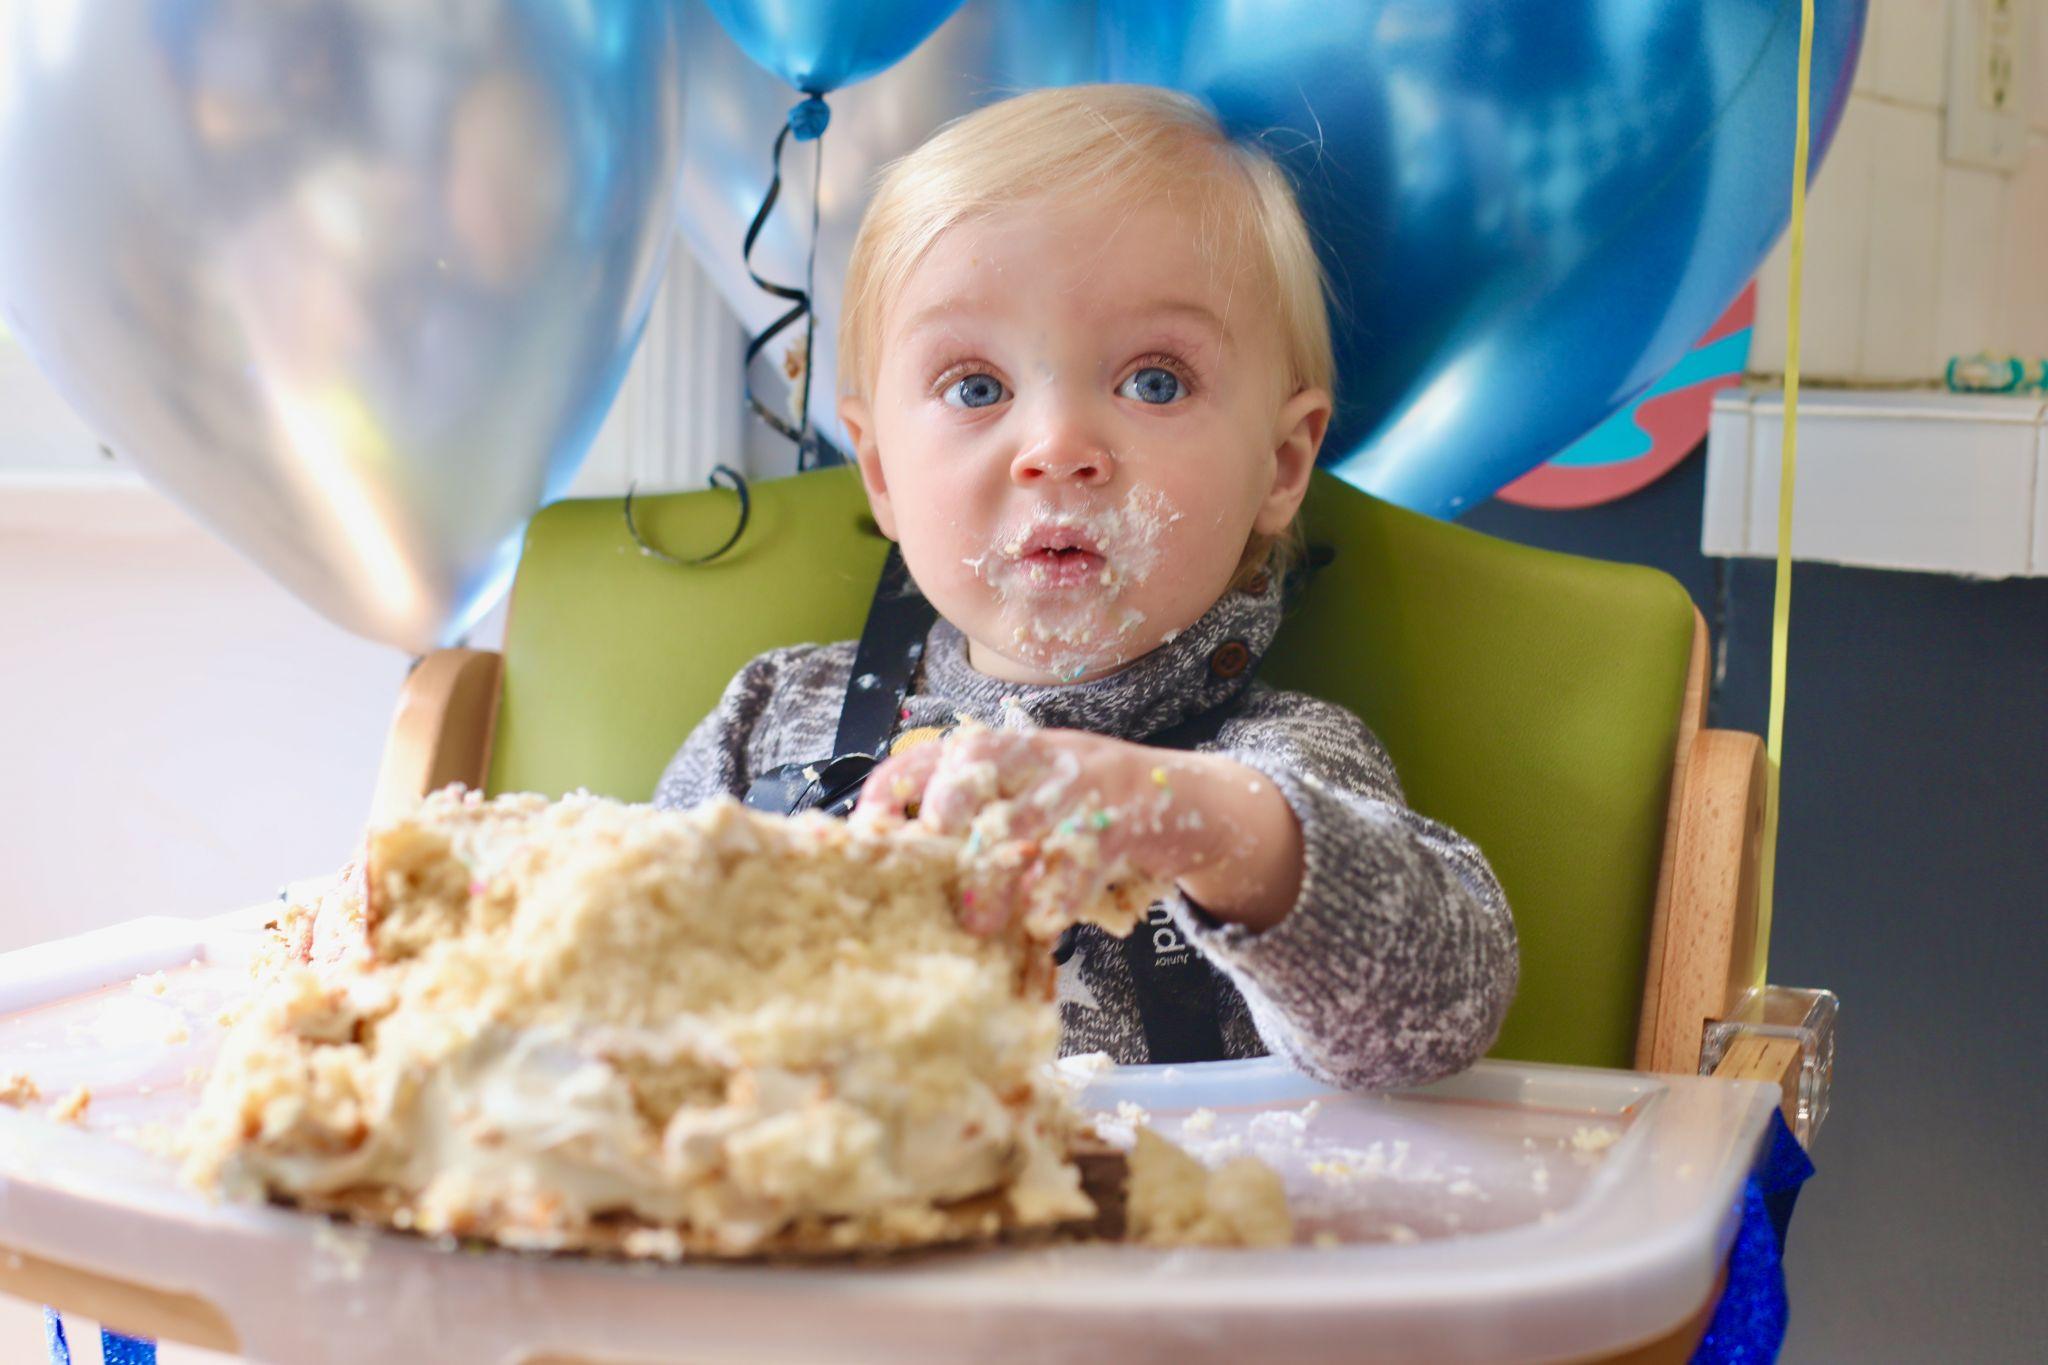 A baby eating a smash cake.